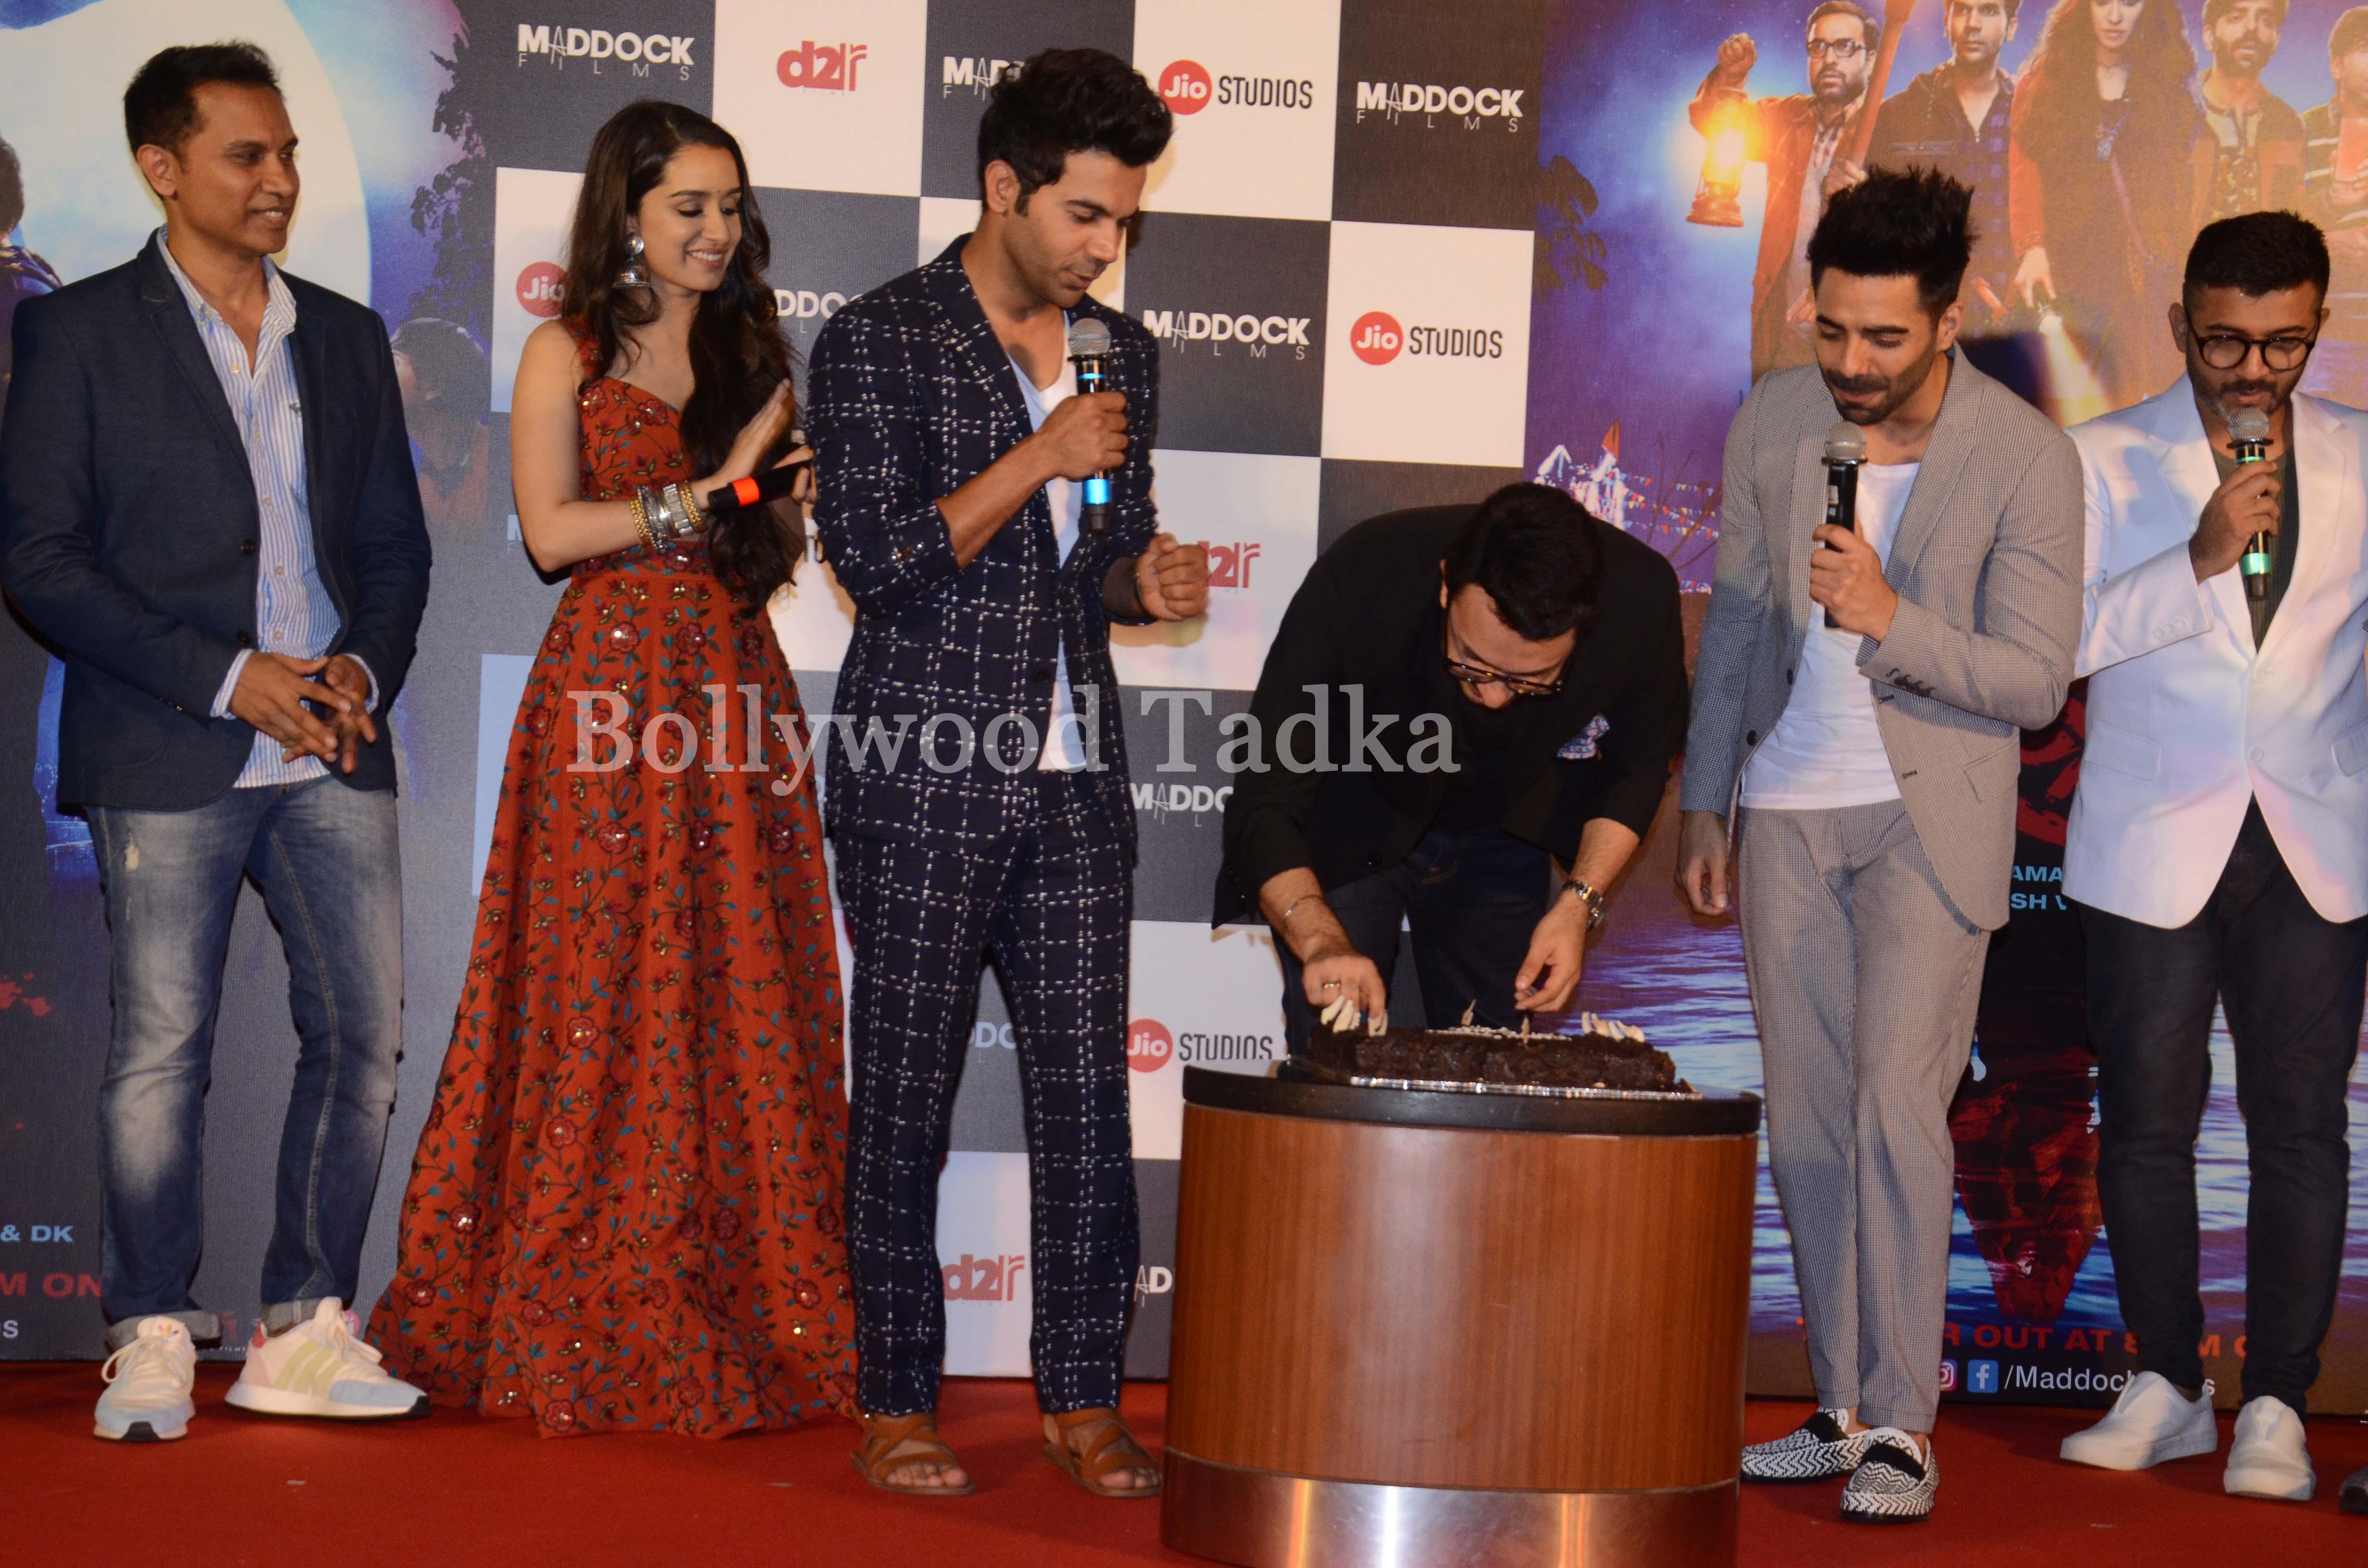 Bollywood Tadka, shraddha kapoor photo, raj kumar rao photo,श्रद्धा कपूर फोटो , राज कुमार राओ फोटो